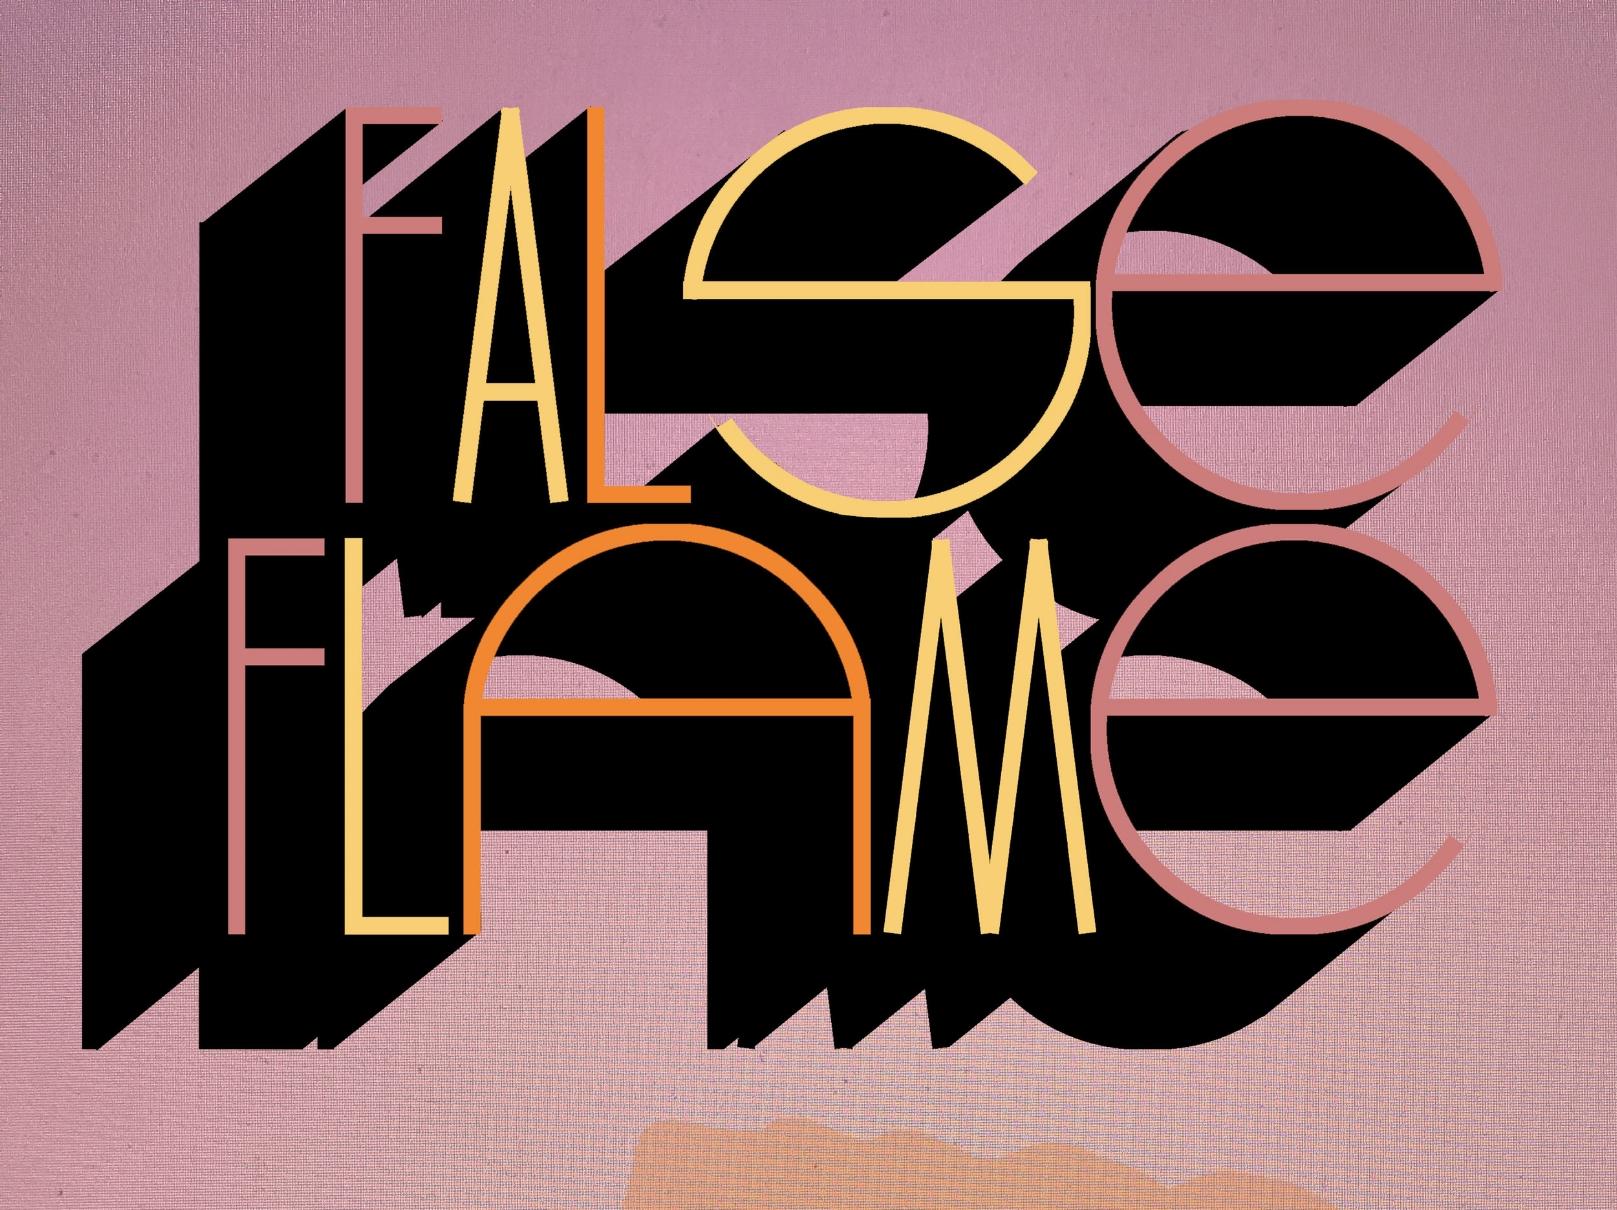 FalseFlame3.jpg